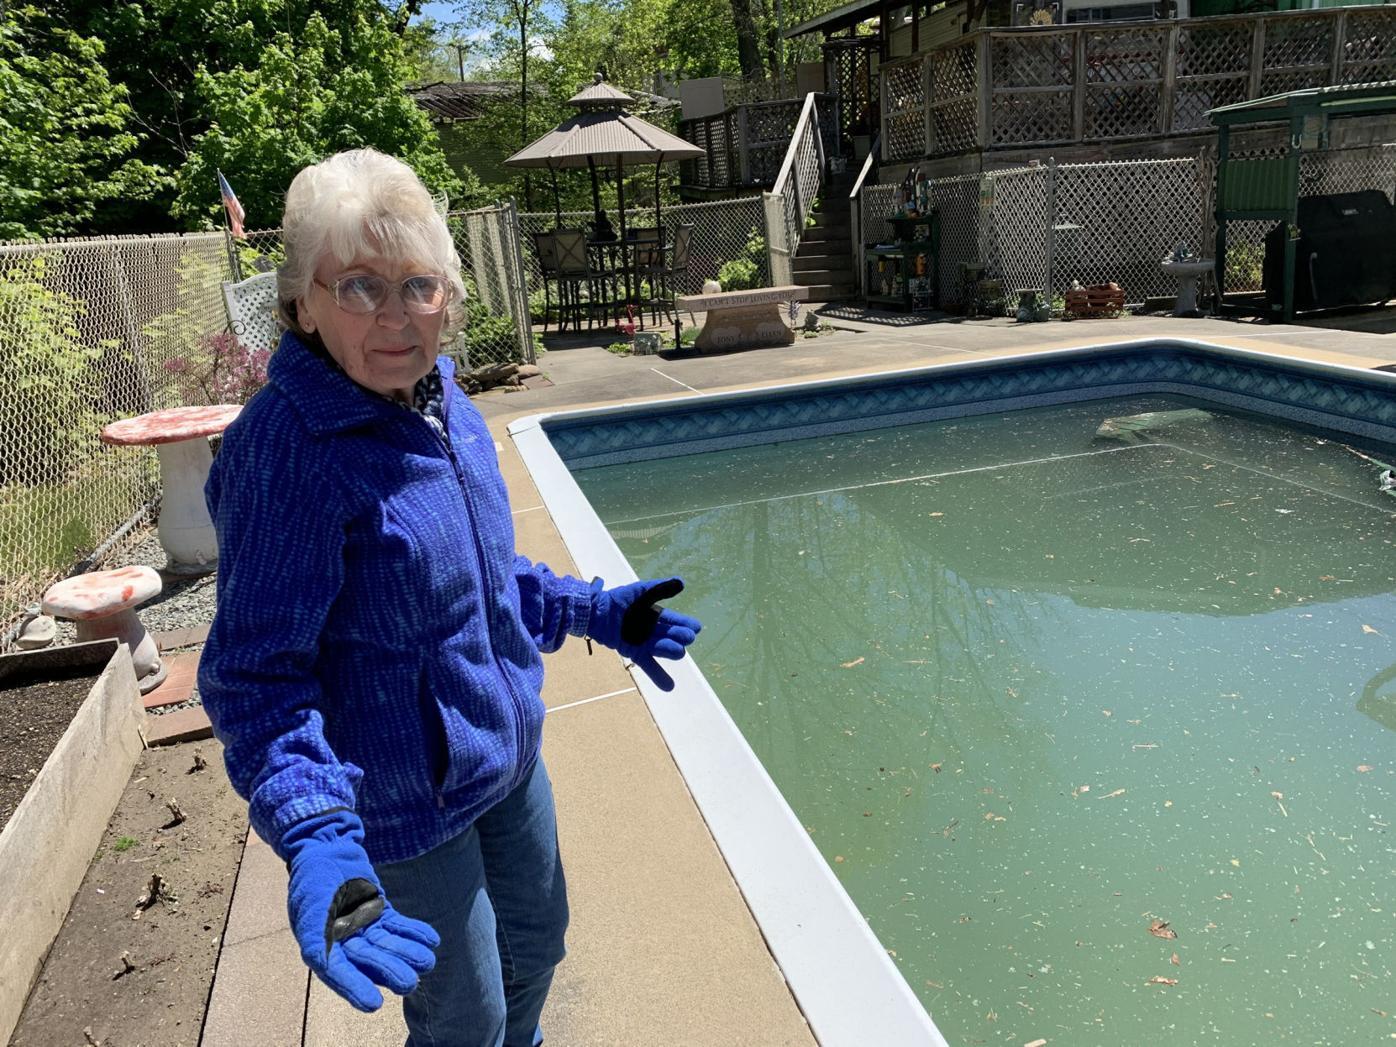 North Scranton creek spills over, floods backyard pool